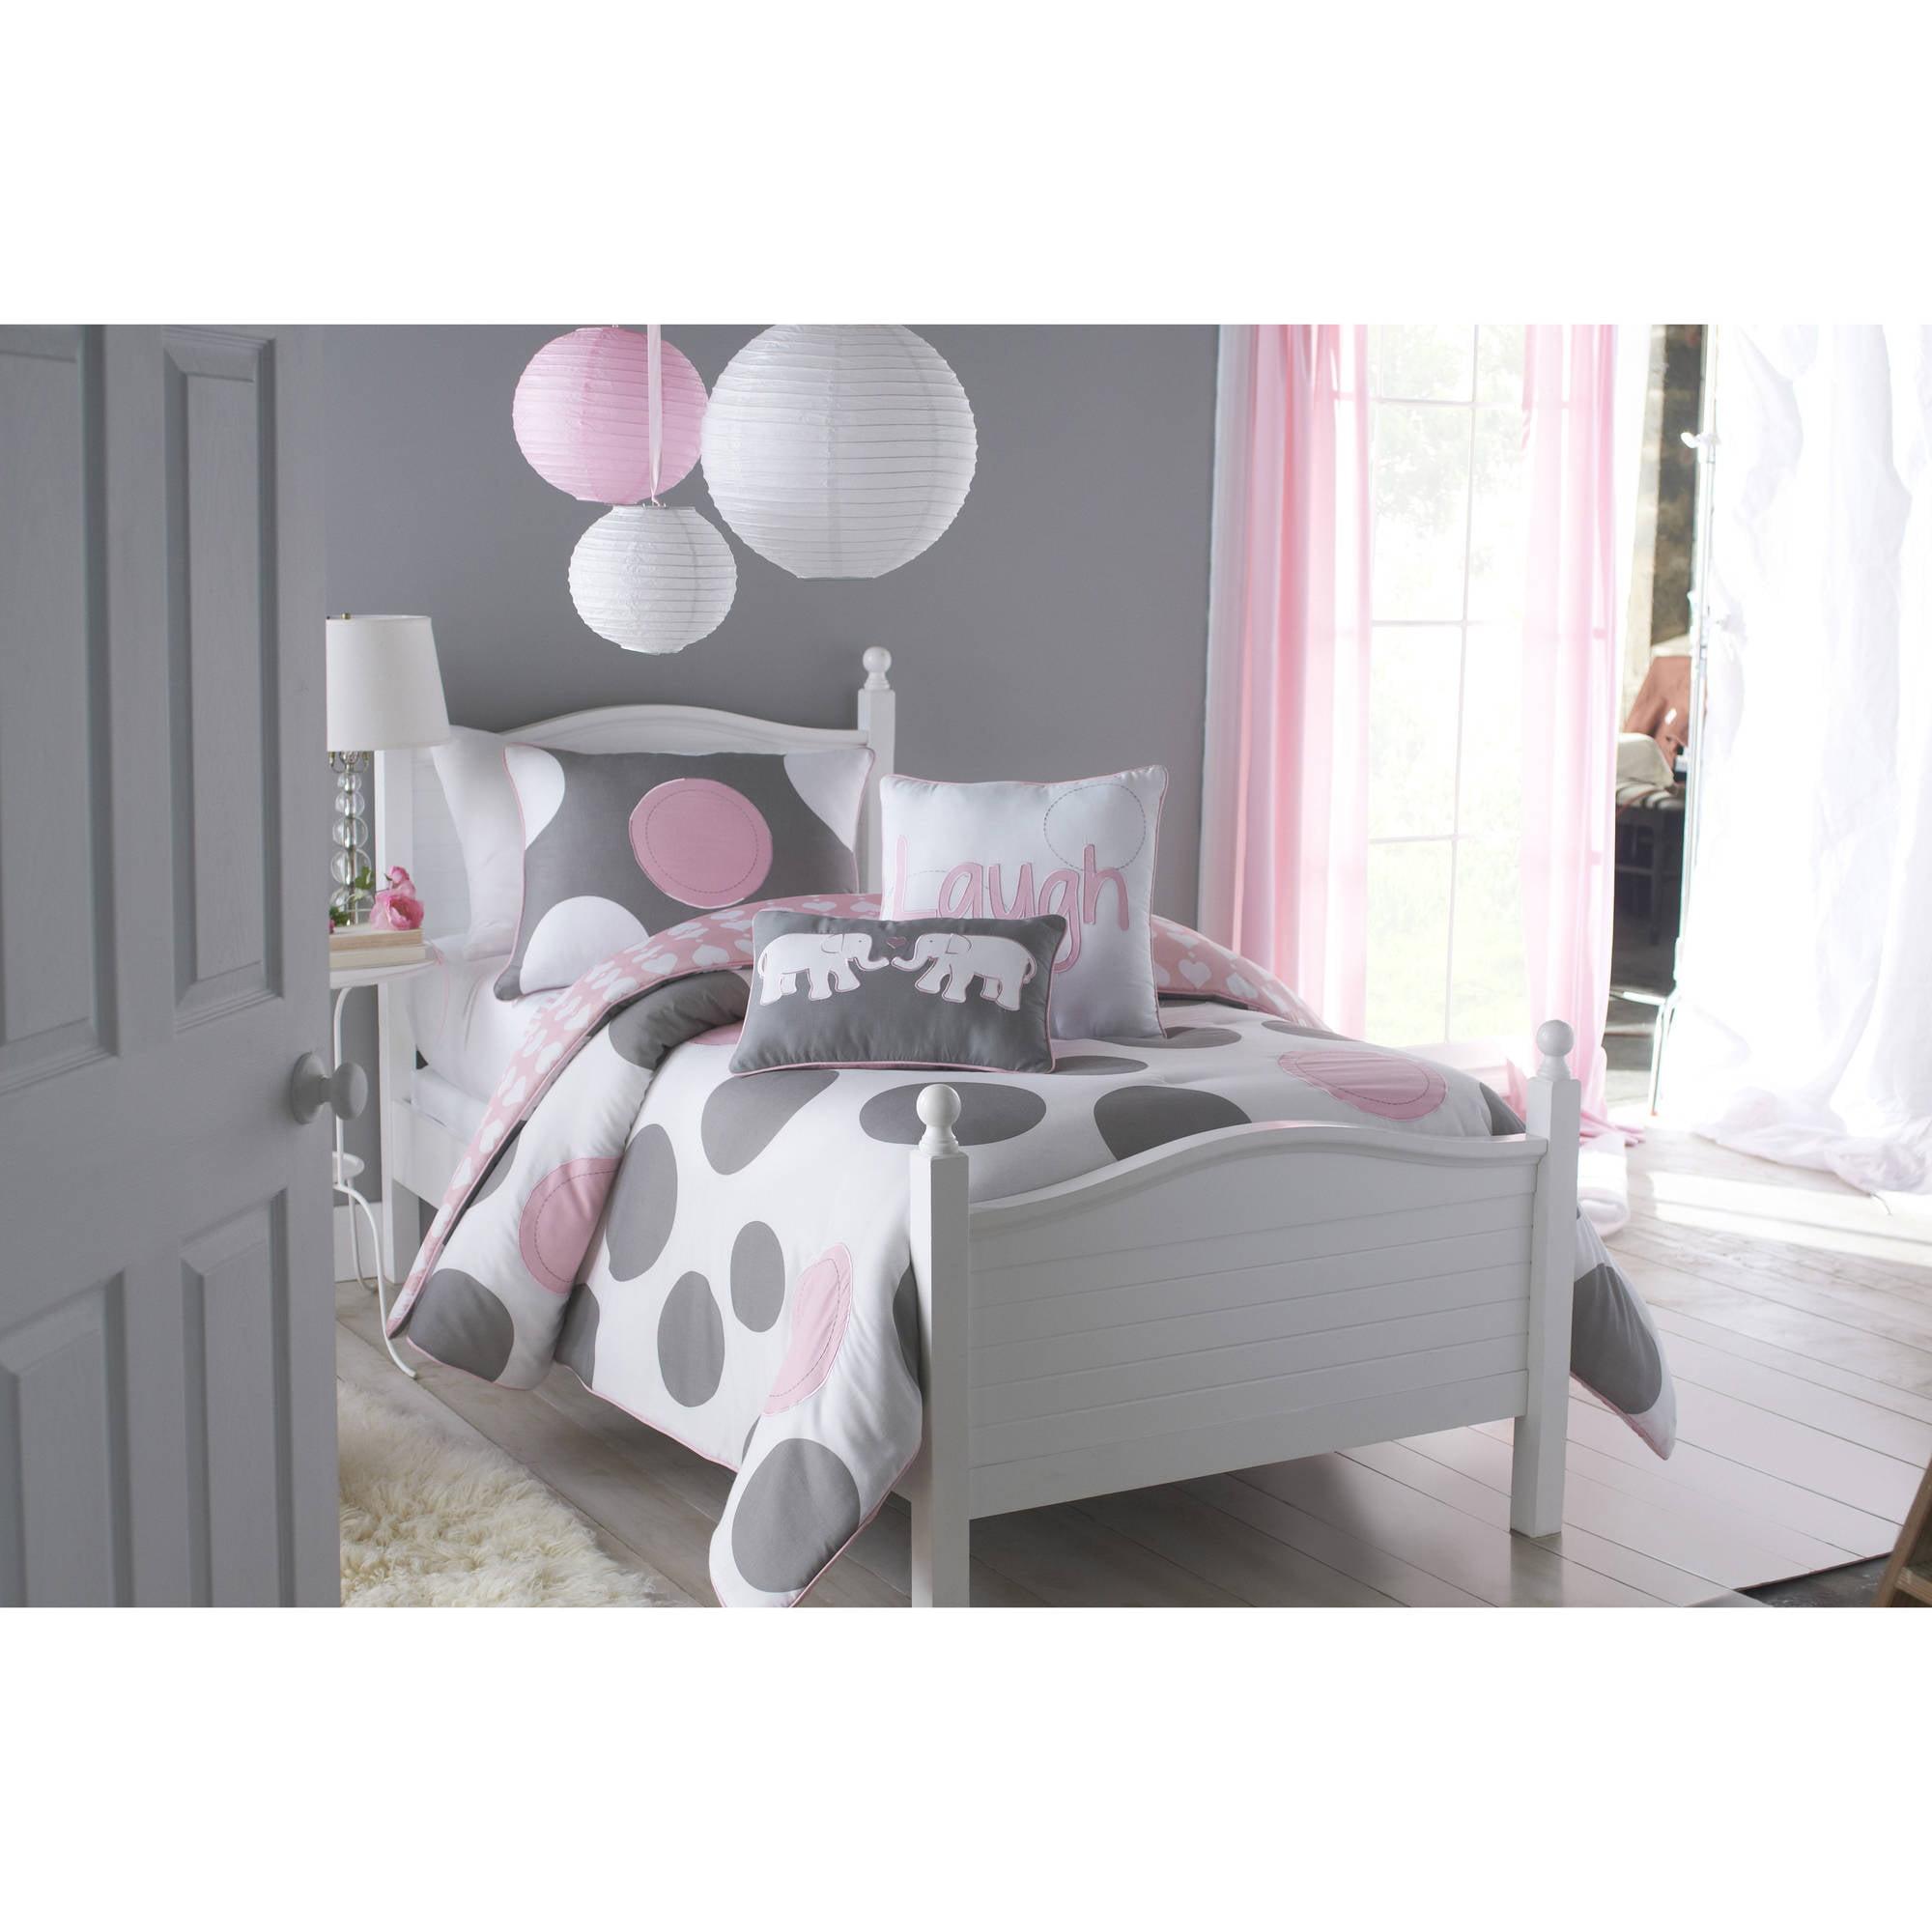 VCNY Home Pink Parade Polka-Dot Reversible Kids Bedding Comforter Set